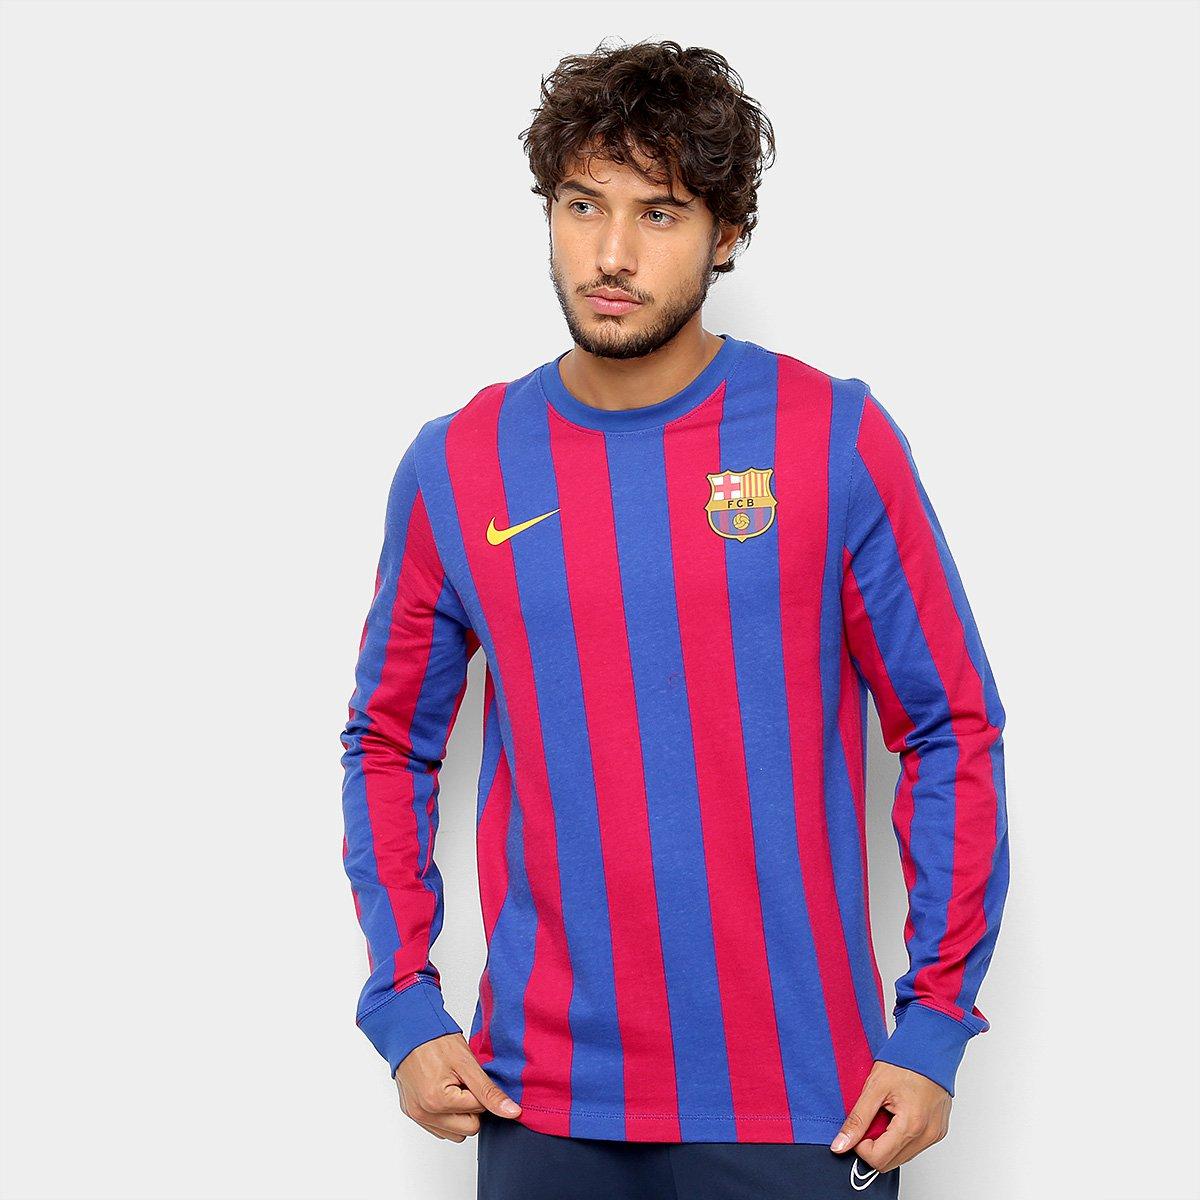 0297ba6425e31 Camiseta Barcelona Retrô Manga Longa Nike Masculina - Compre Agora ...